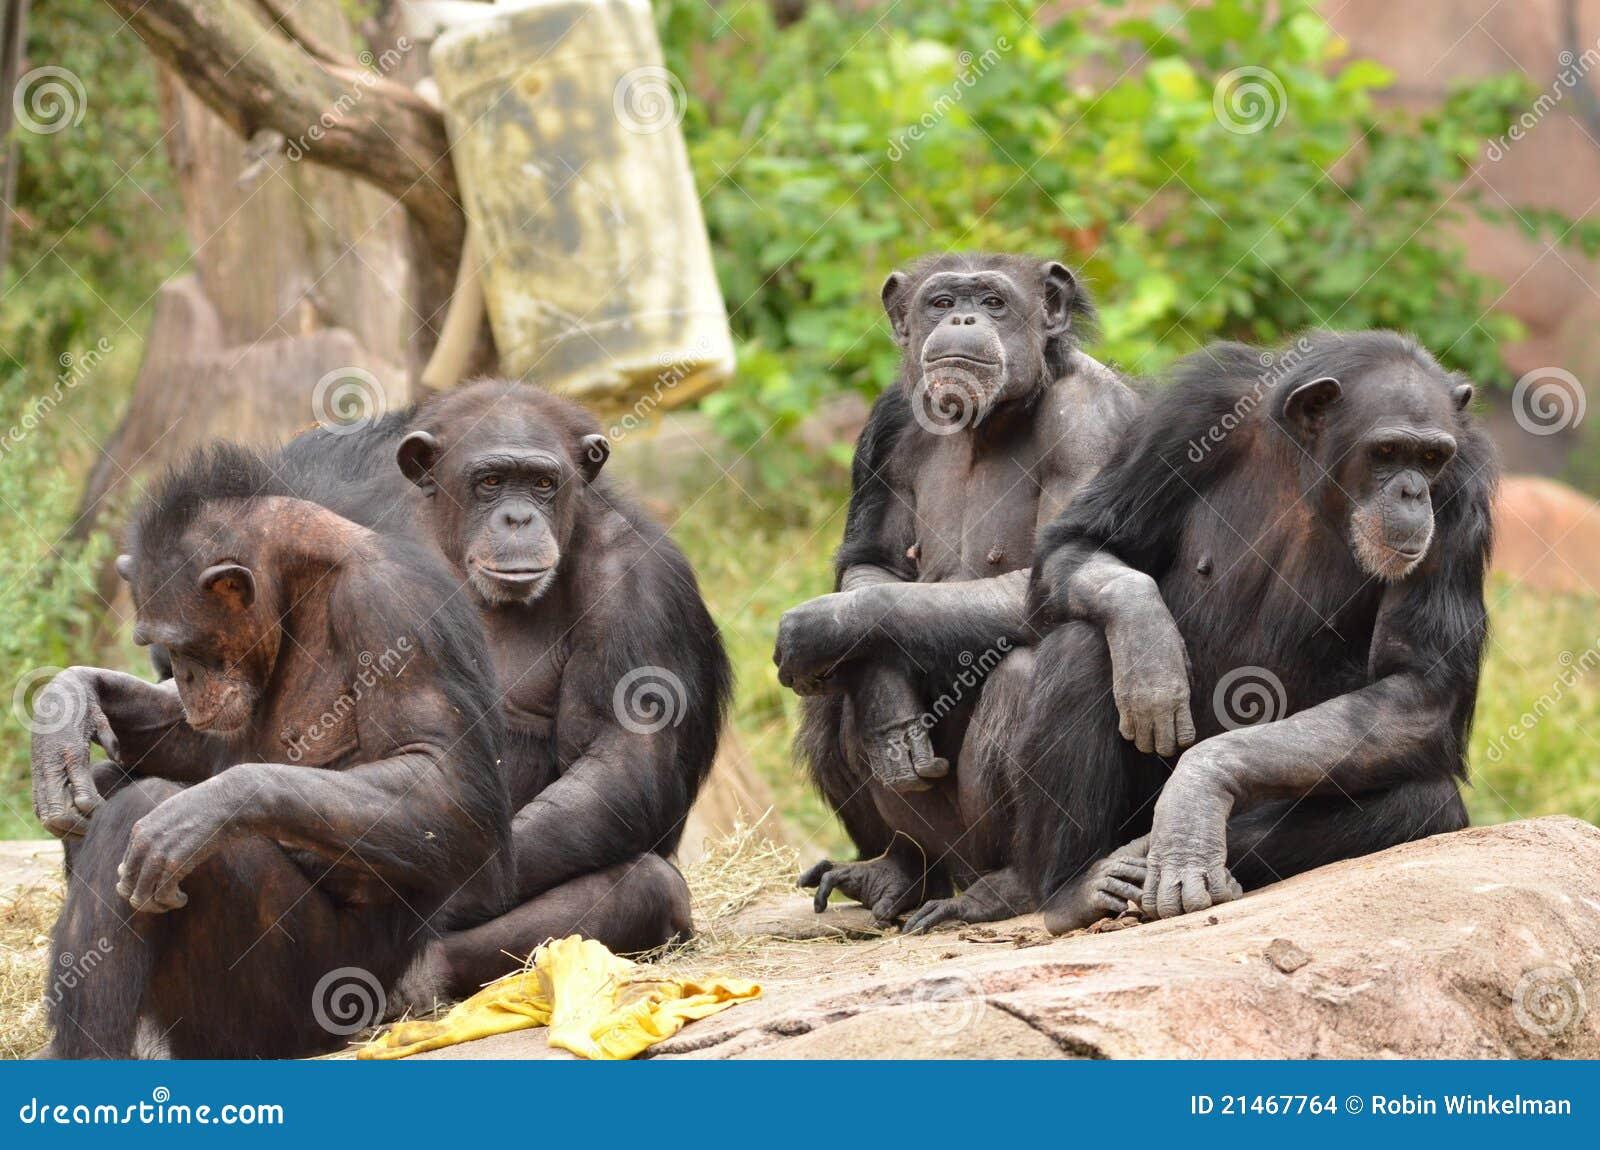 Chimpanzee group